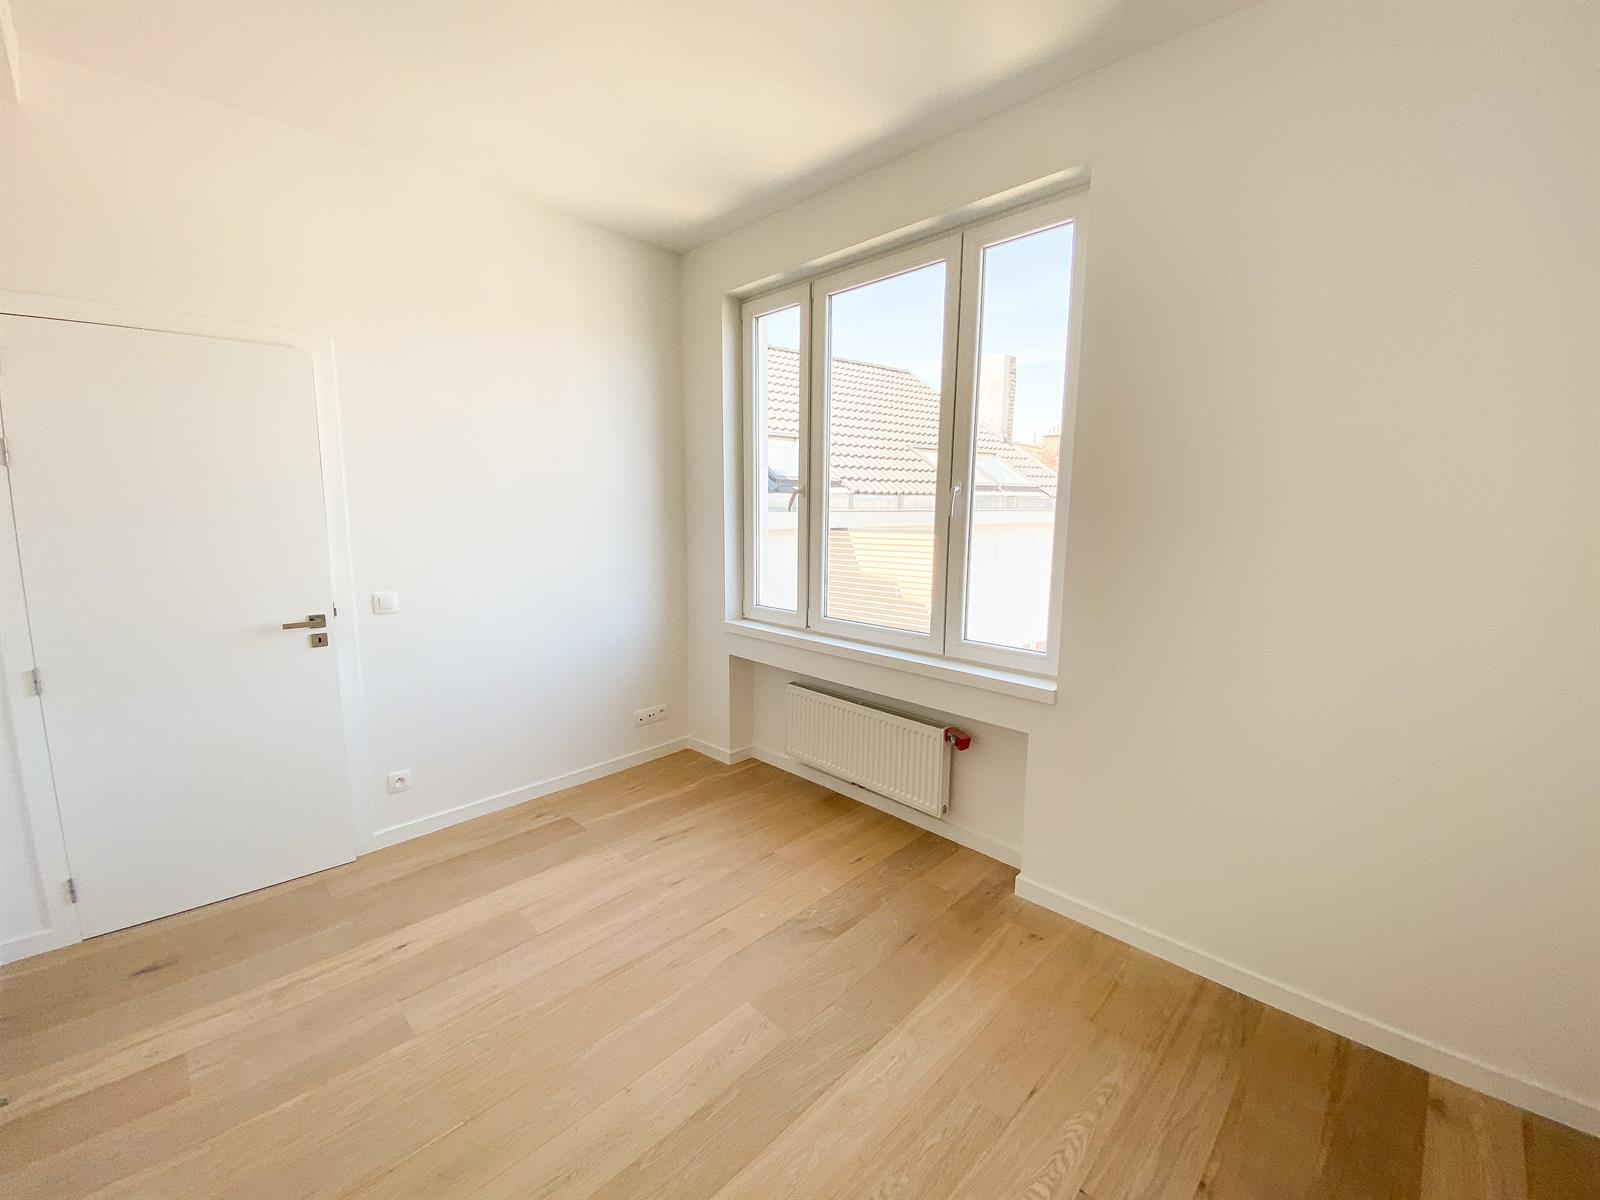 Appartement - Liège - #4045830-11